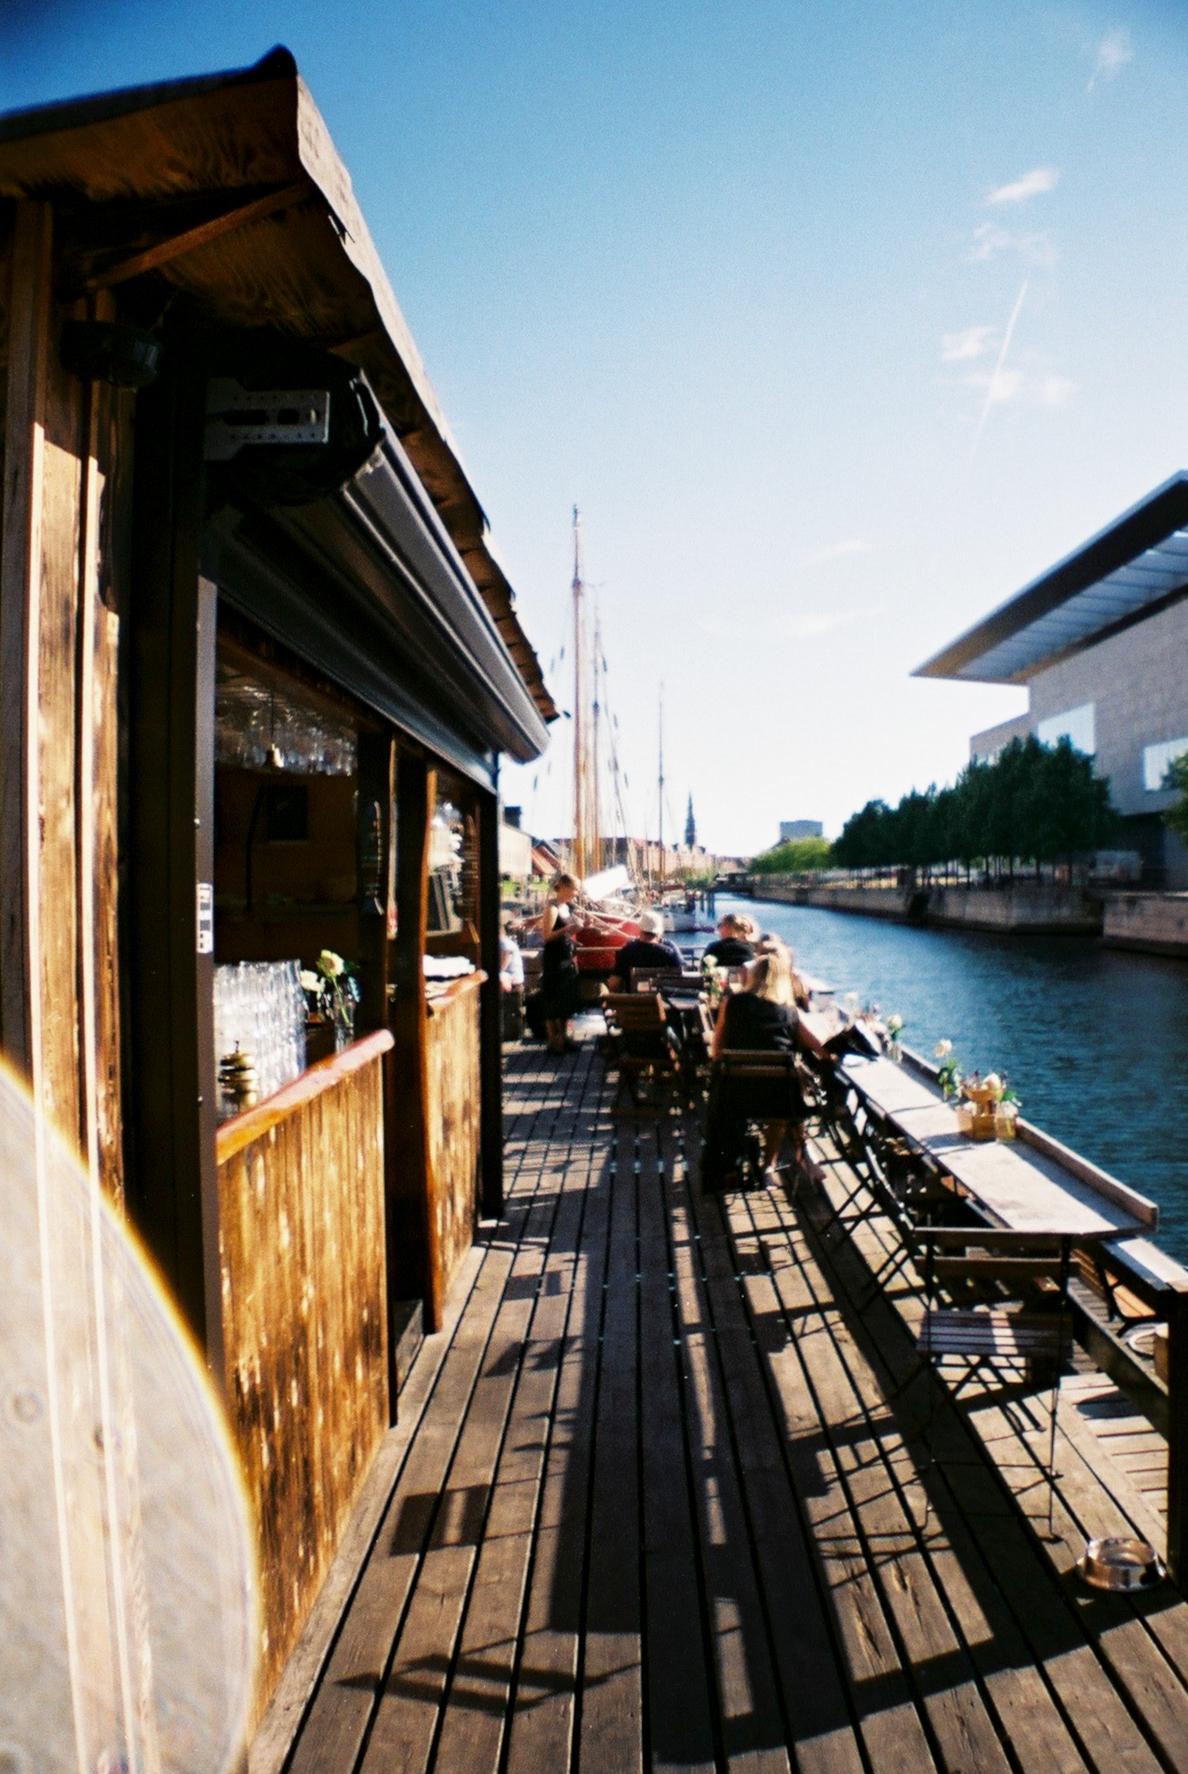 Kontiki Bar Restaurant Floating Ferry Canal Opera house Holmen København Copenhagen Copenhej